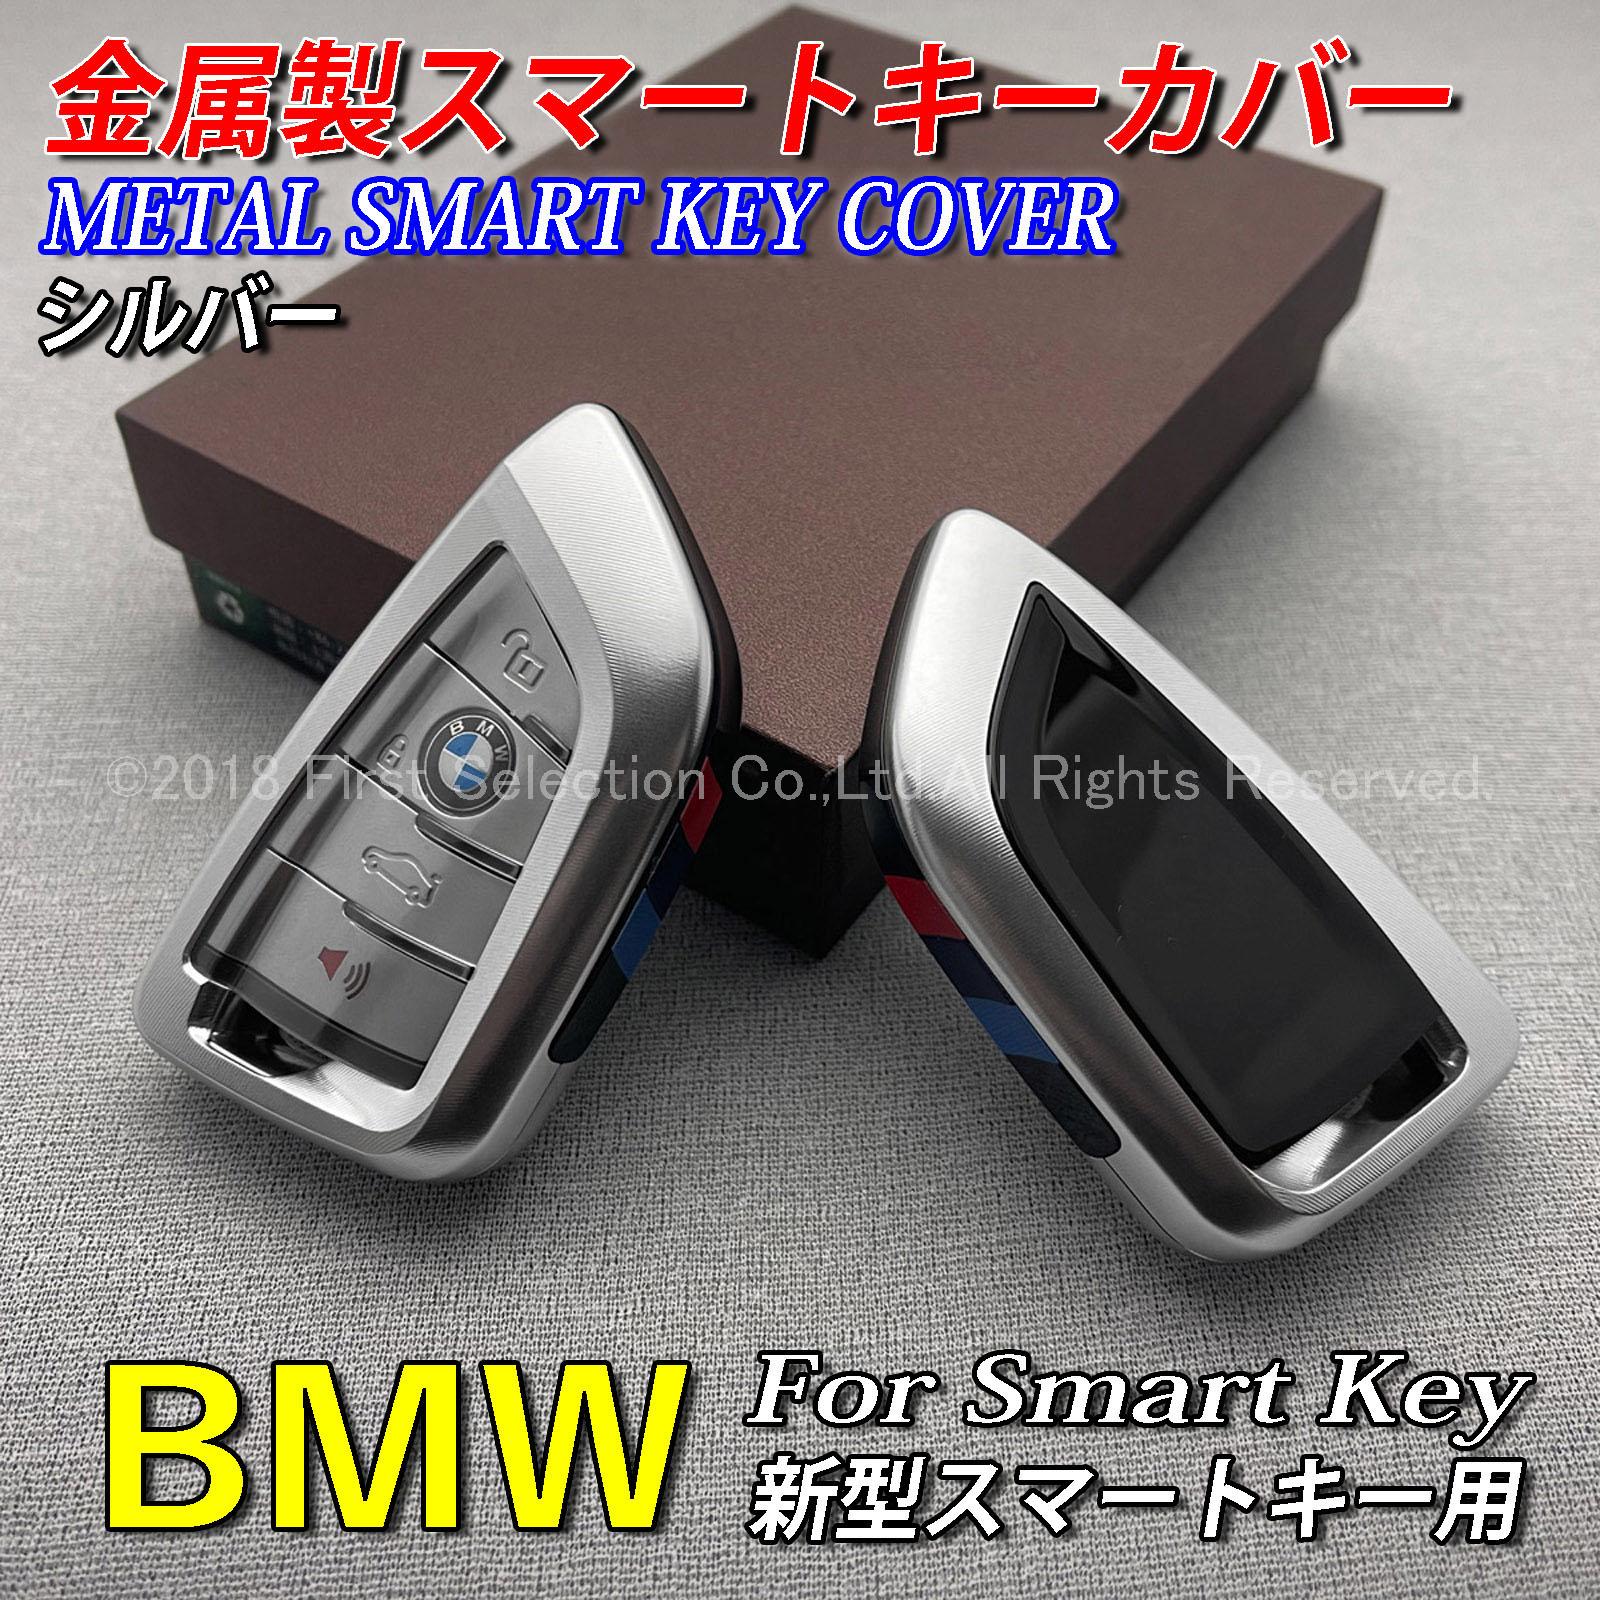 BMW 新型スマートキー用 軽量金属製スマートキーカバー銀 F40 F45 F46 F44 G20 G30 G32 G14 G15 F48 F39 G01 G02 F15 G05 F16 G06 G07 G29